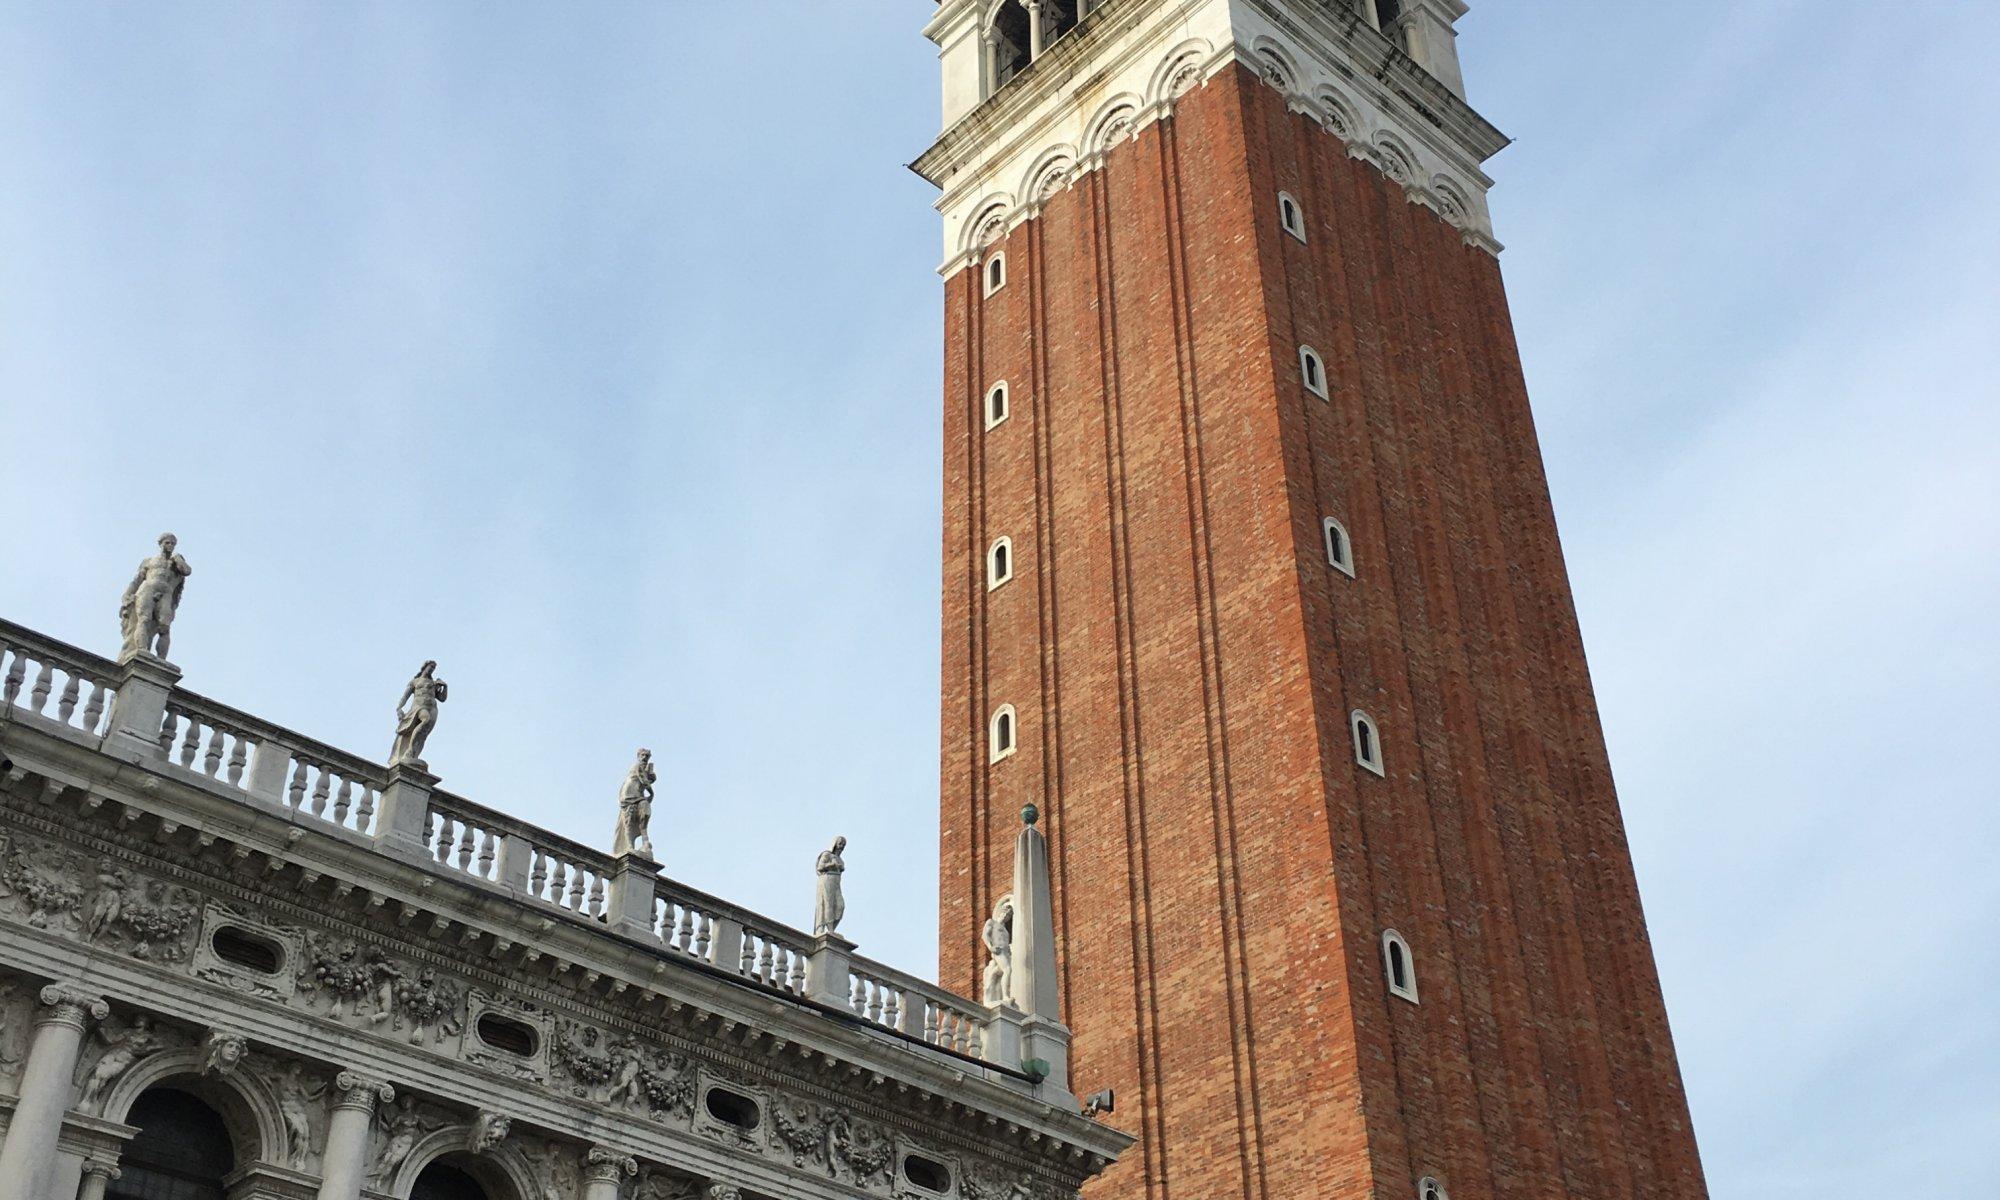 Campanile di San Marco, Venezia